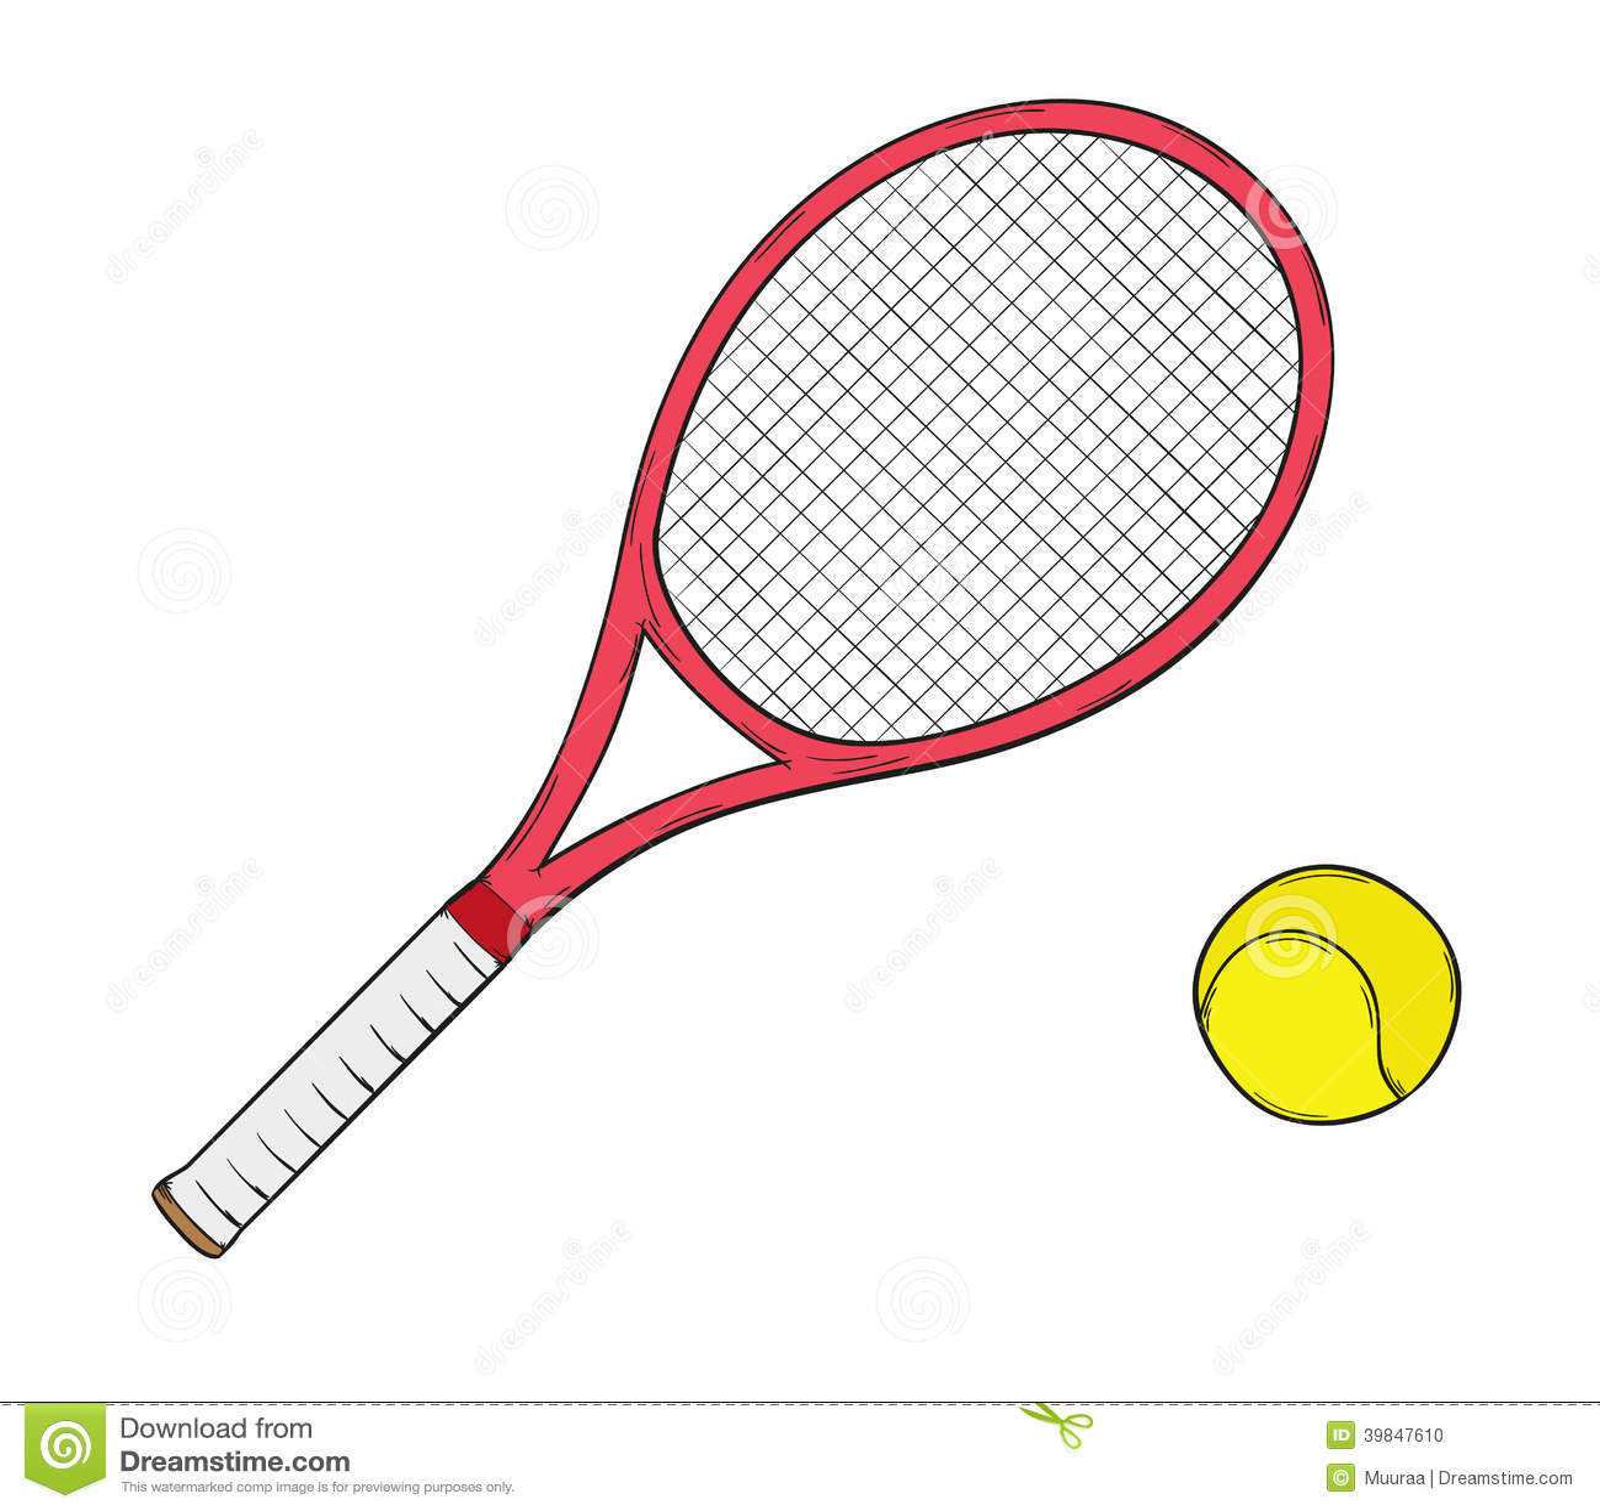 Ball Racket Sketch Tennis Stock Illustrations 545 Ball Racket